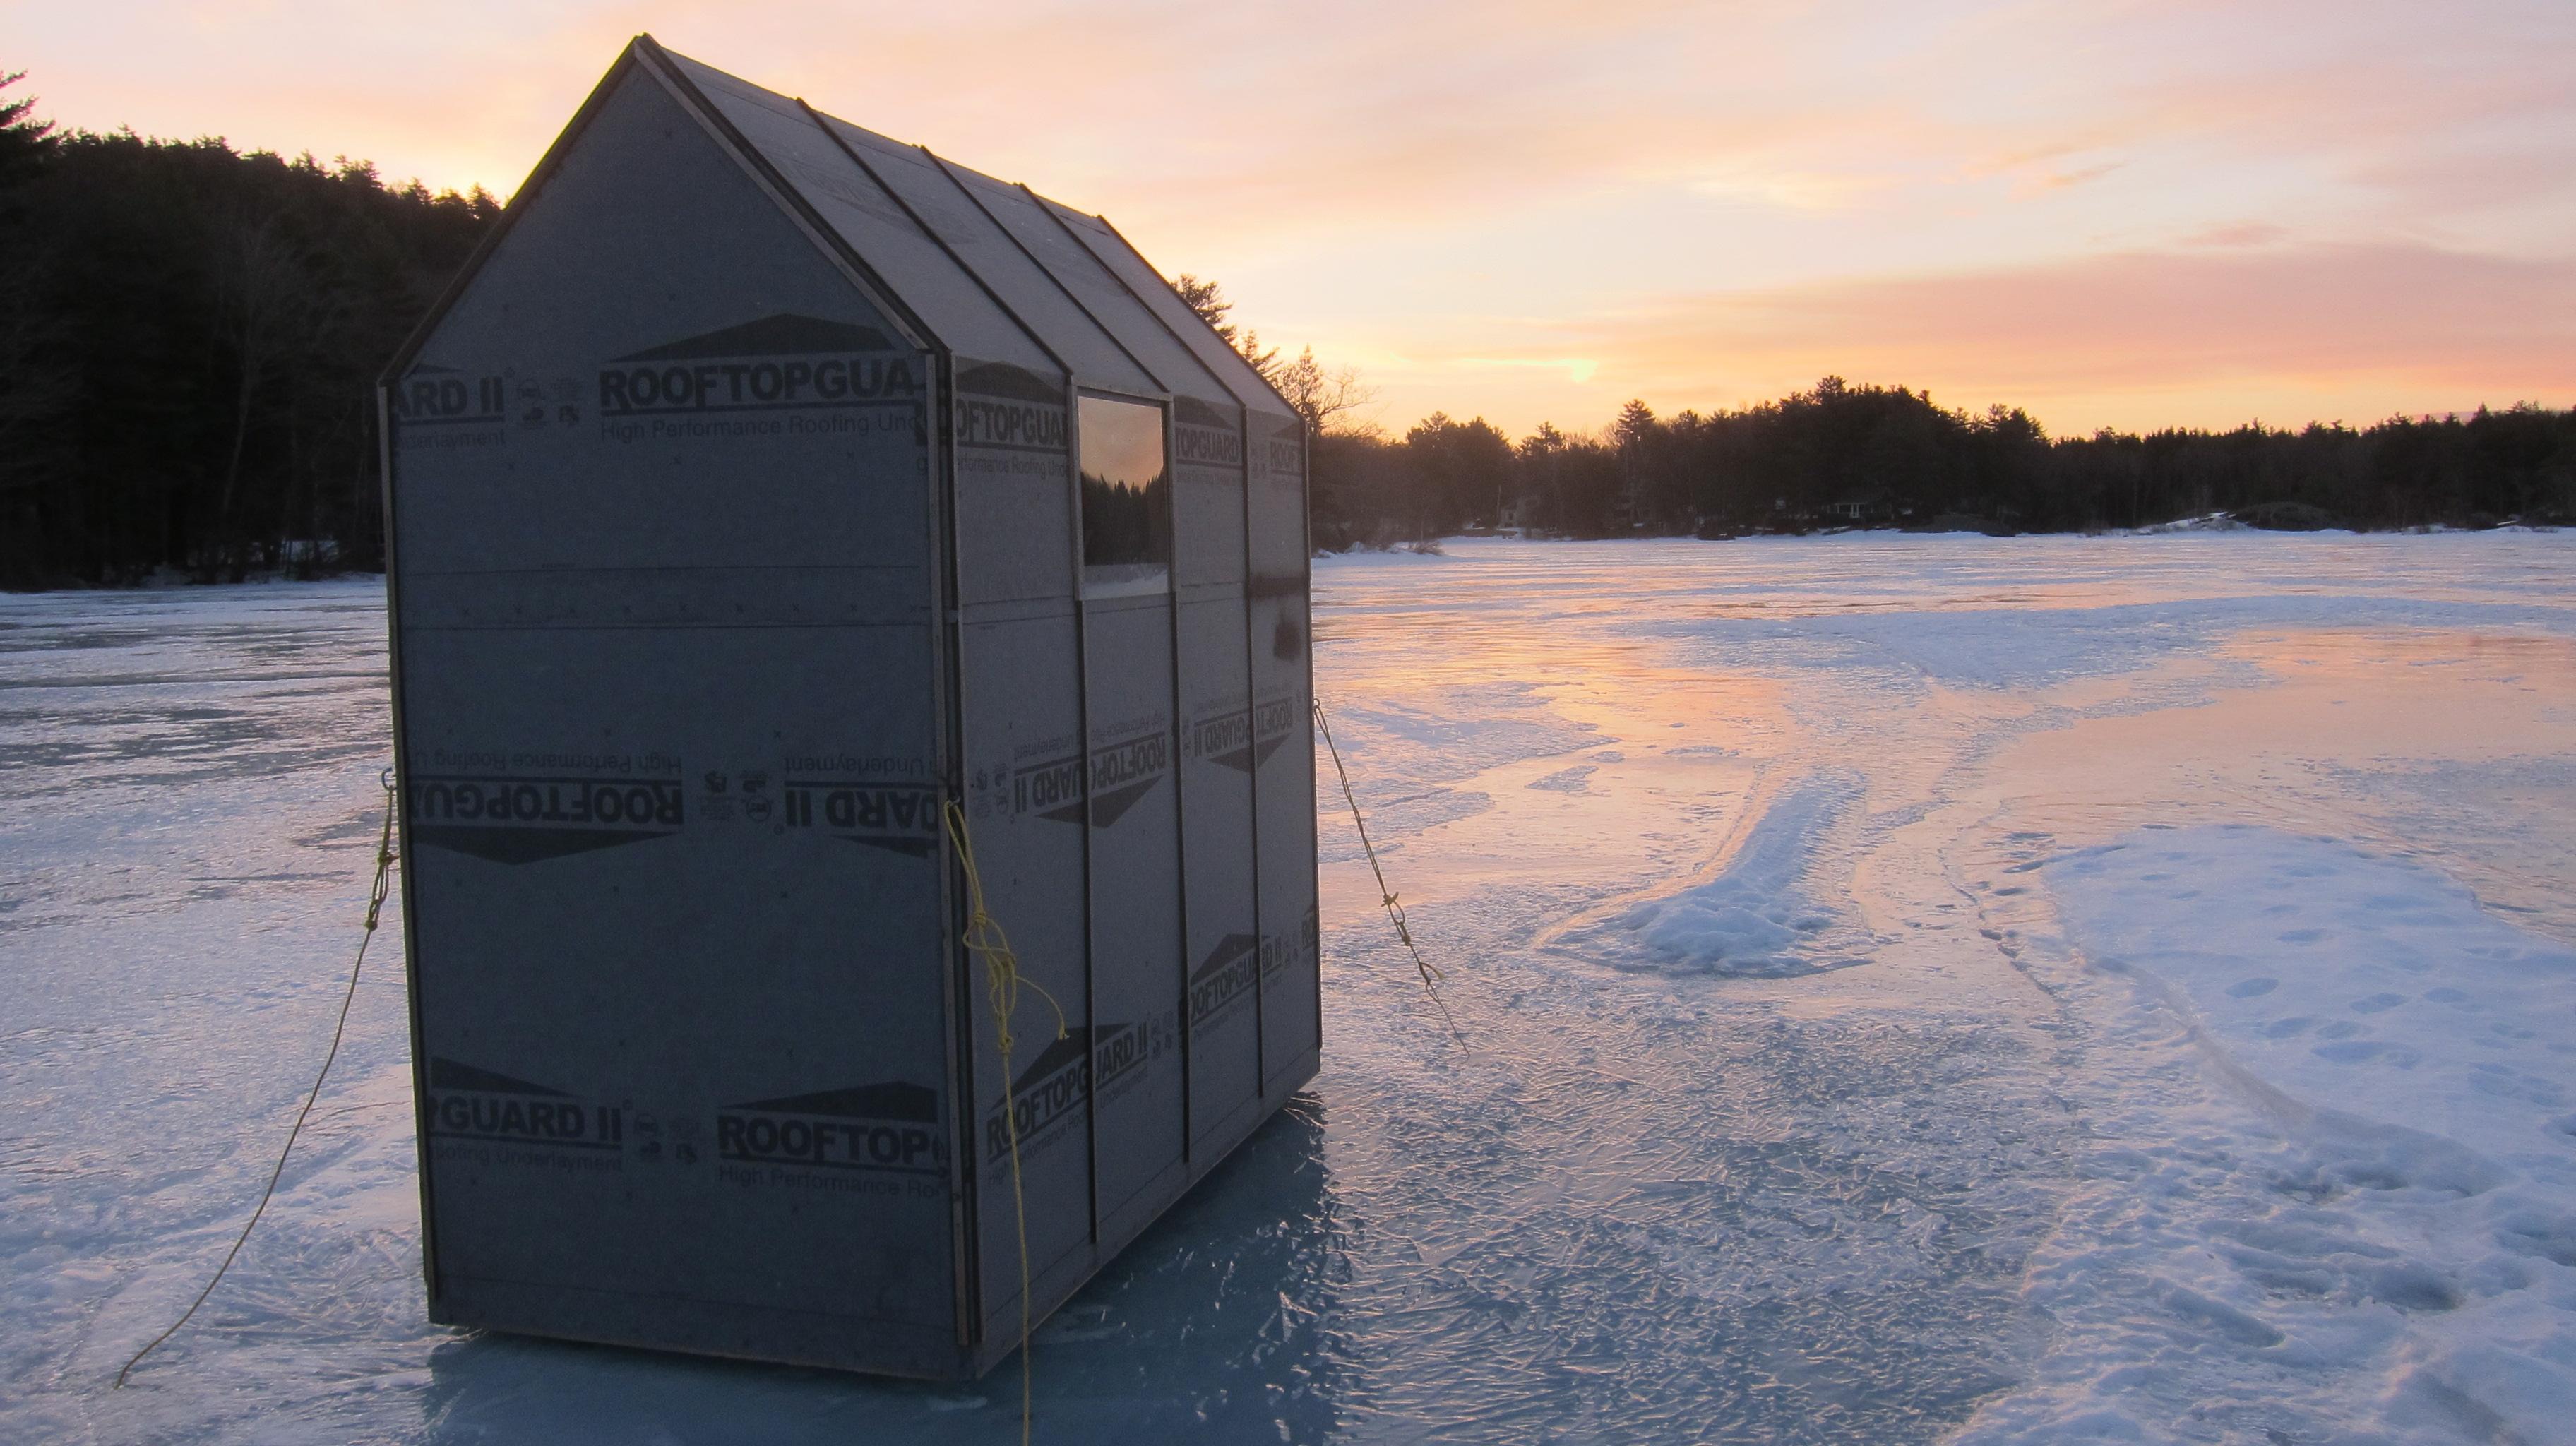 Ice fishing houses - photo#38